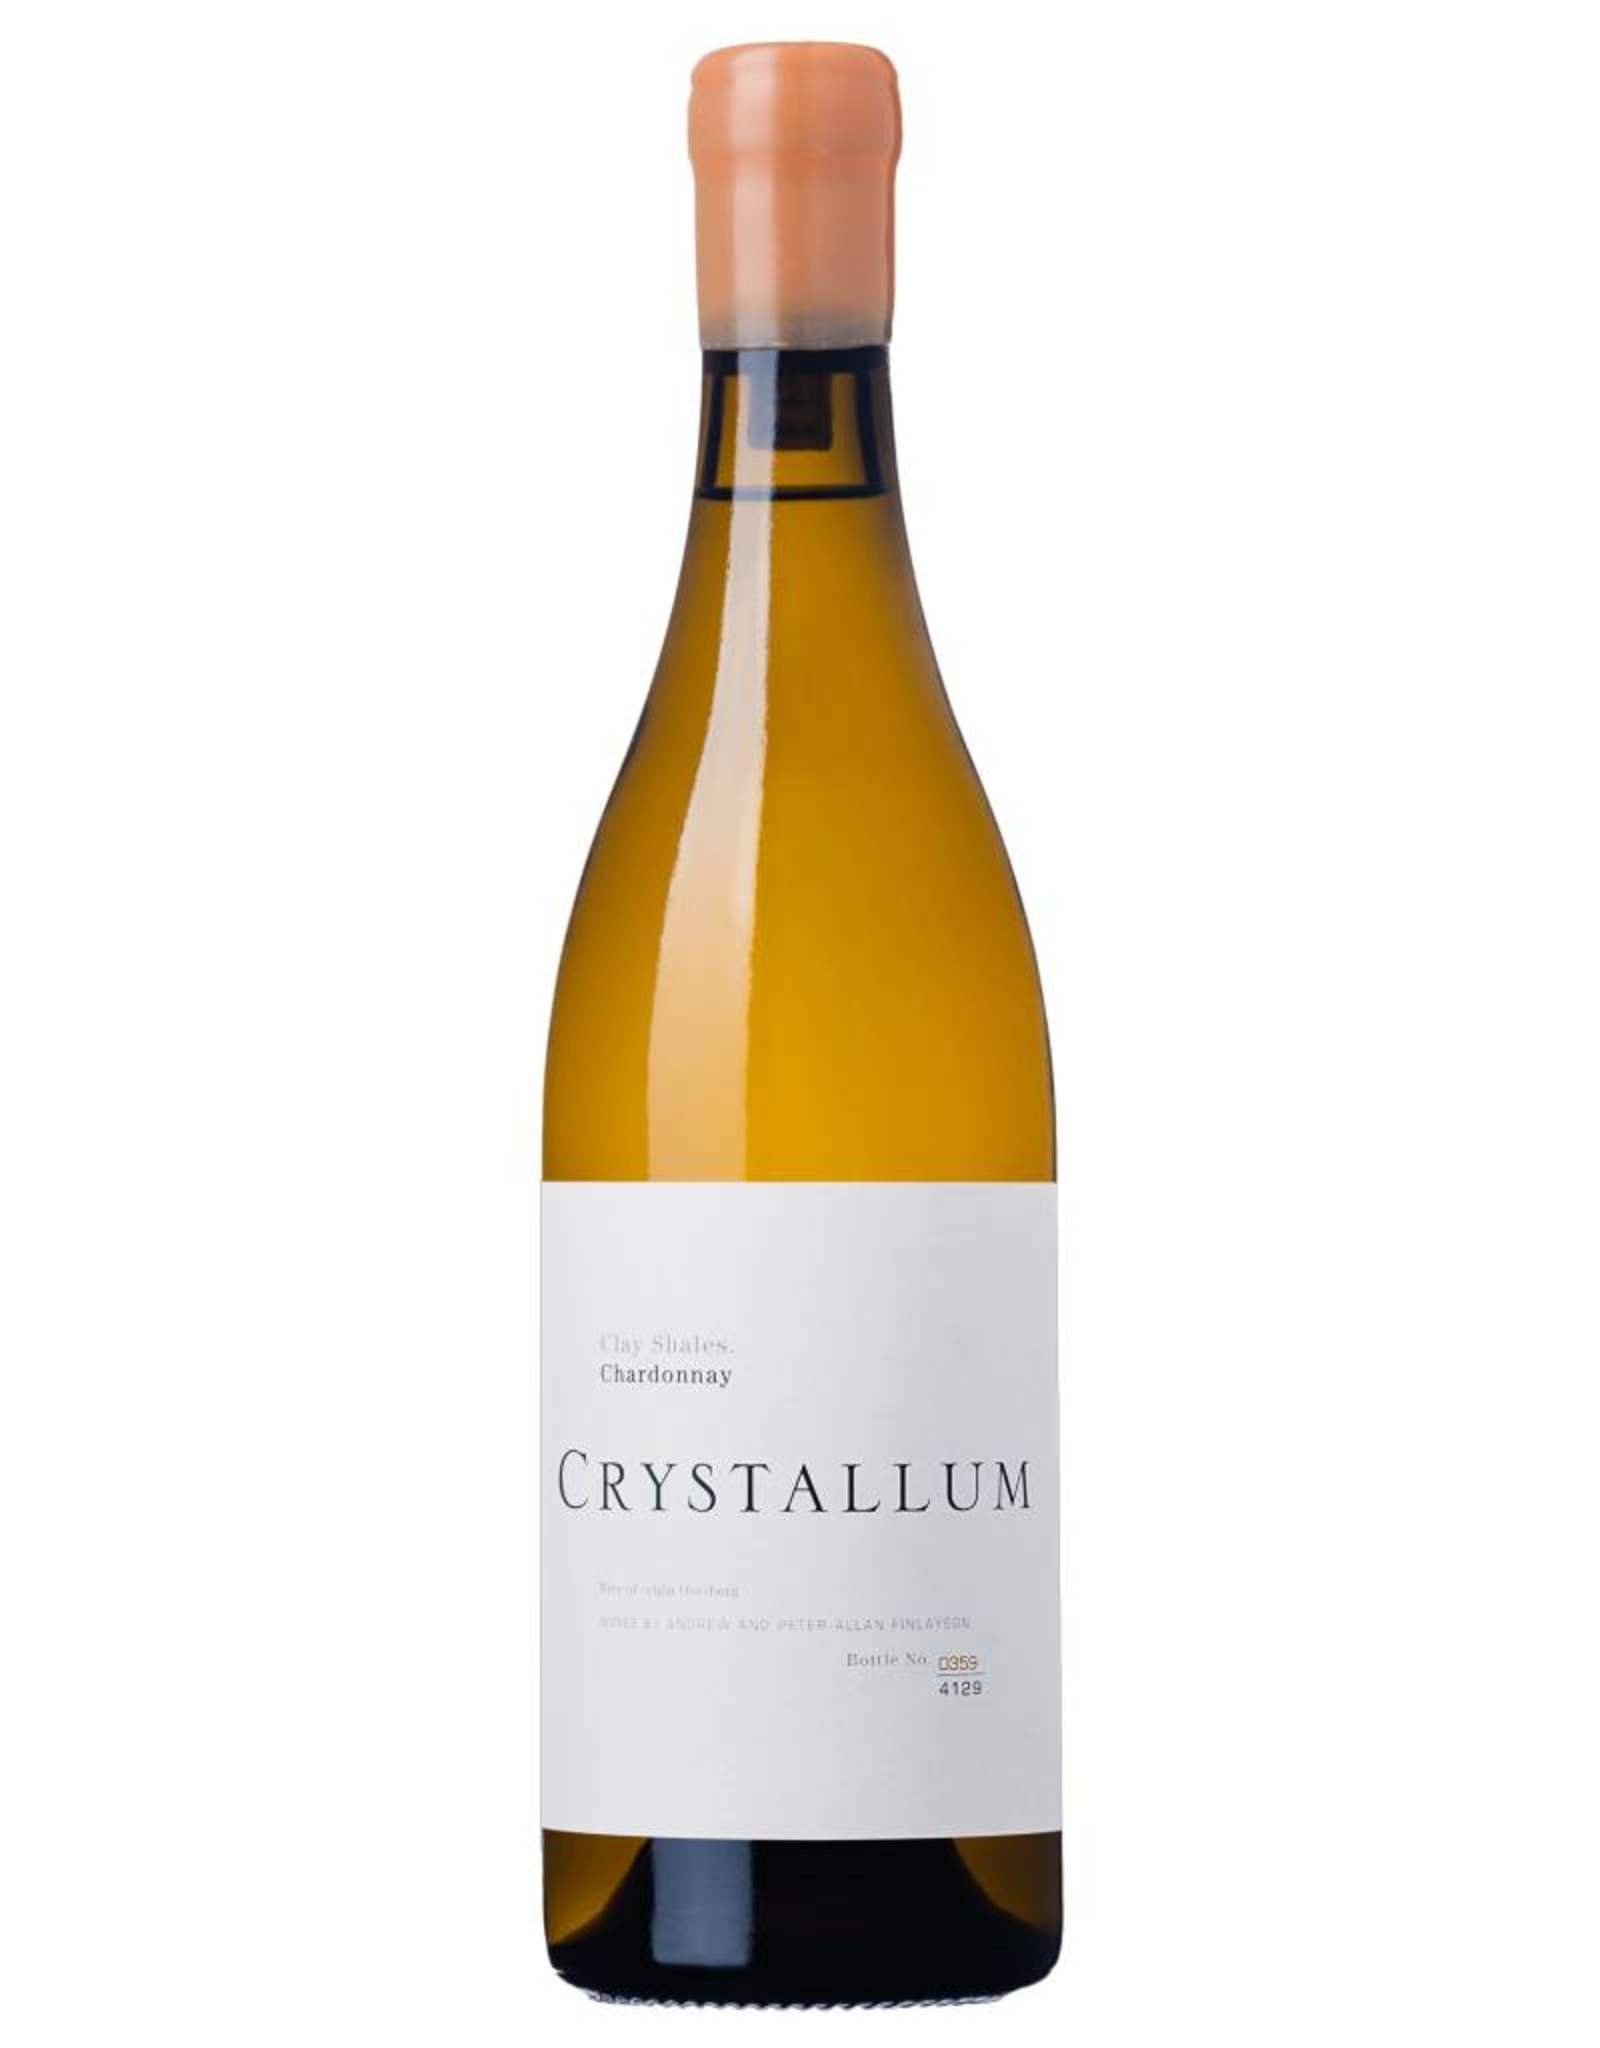 Crystallum - Clay Shales Chardonnay 2020